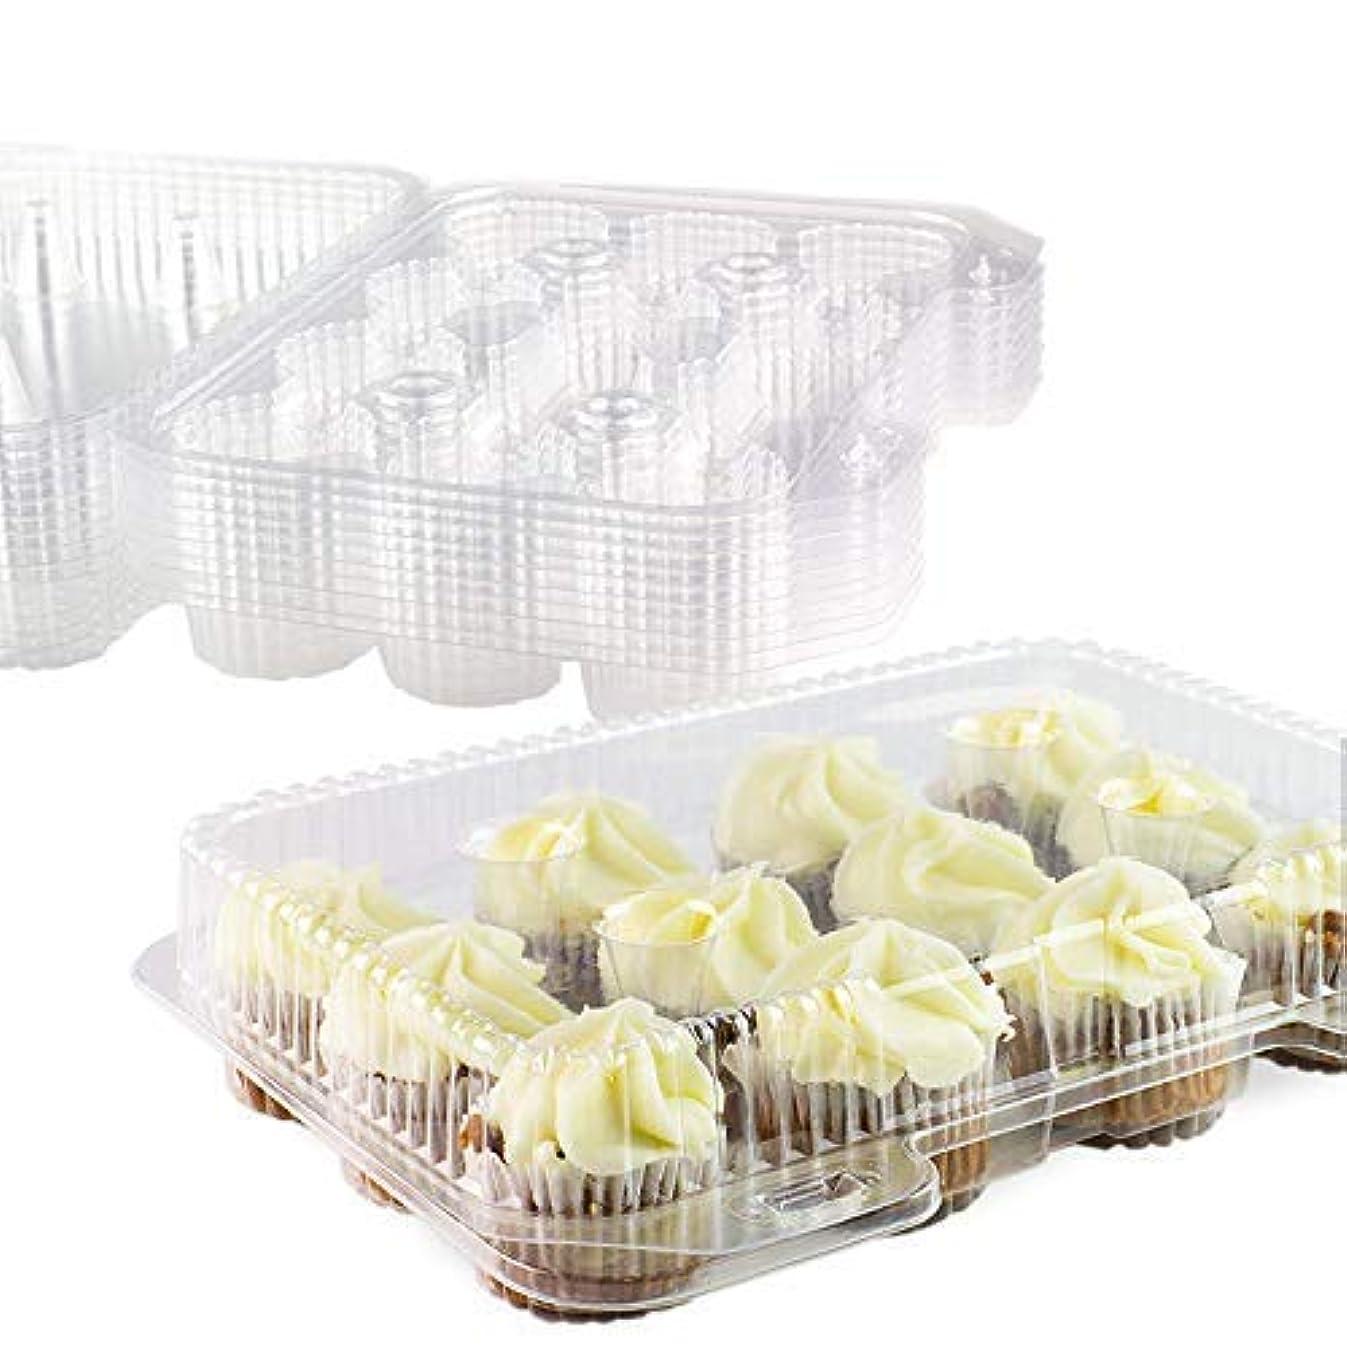 Chefible 12 Mini Cupcake Container, Cupcake Box - Set of 10